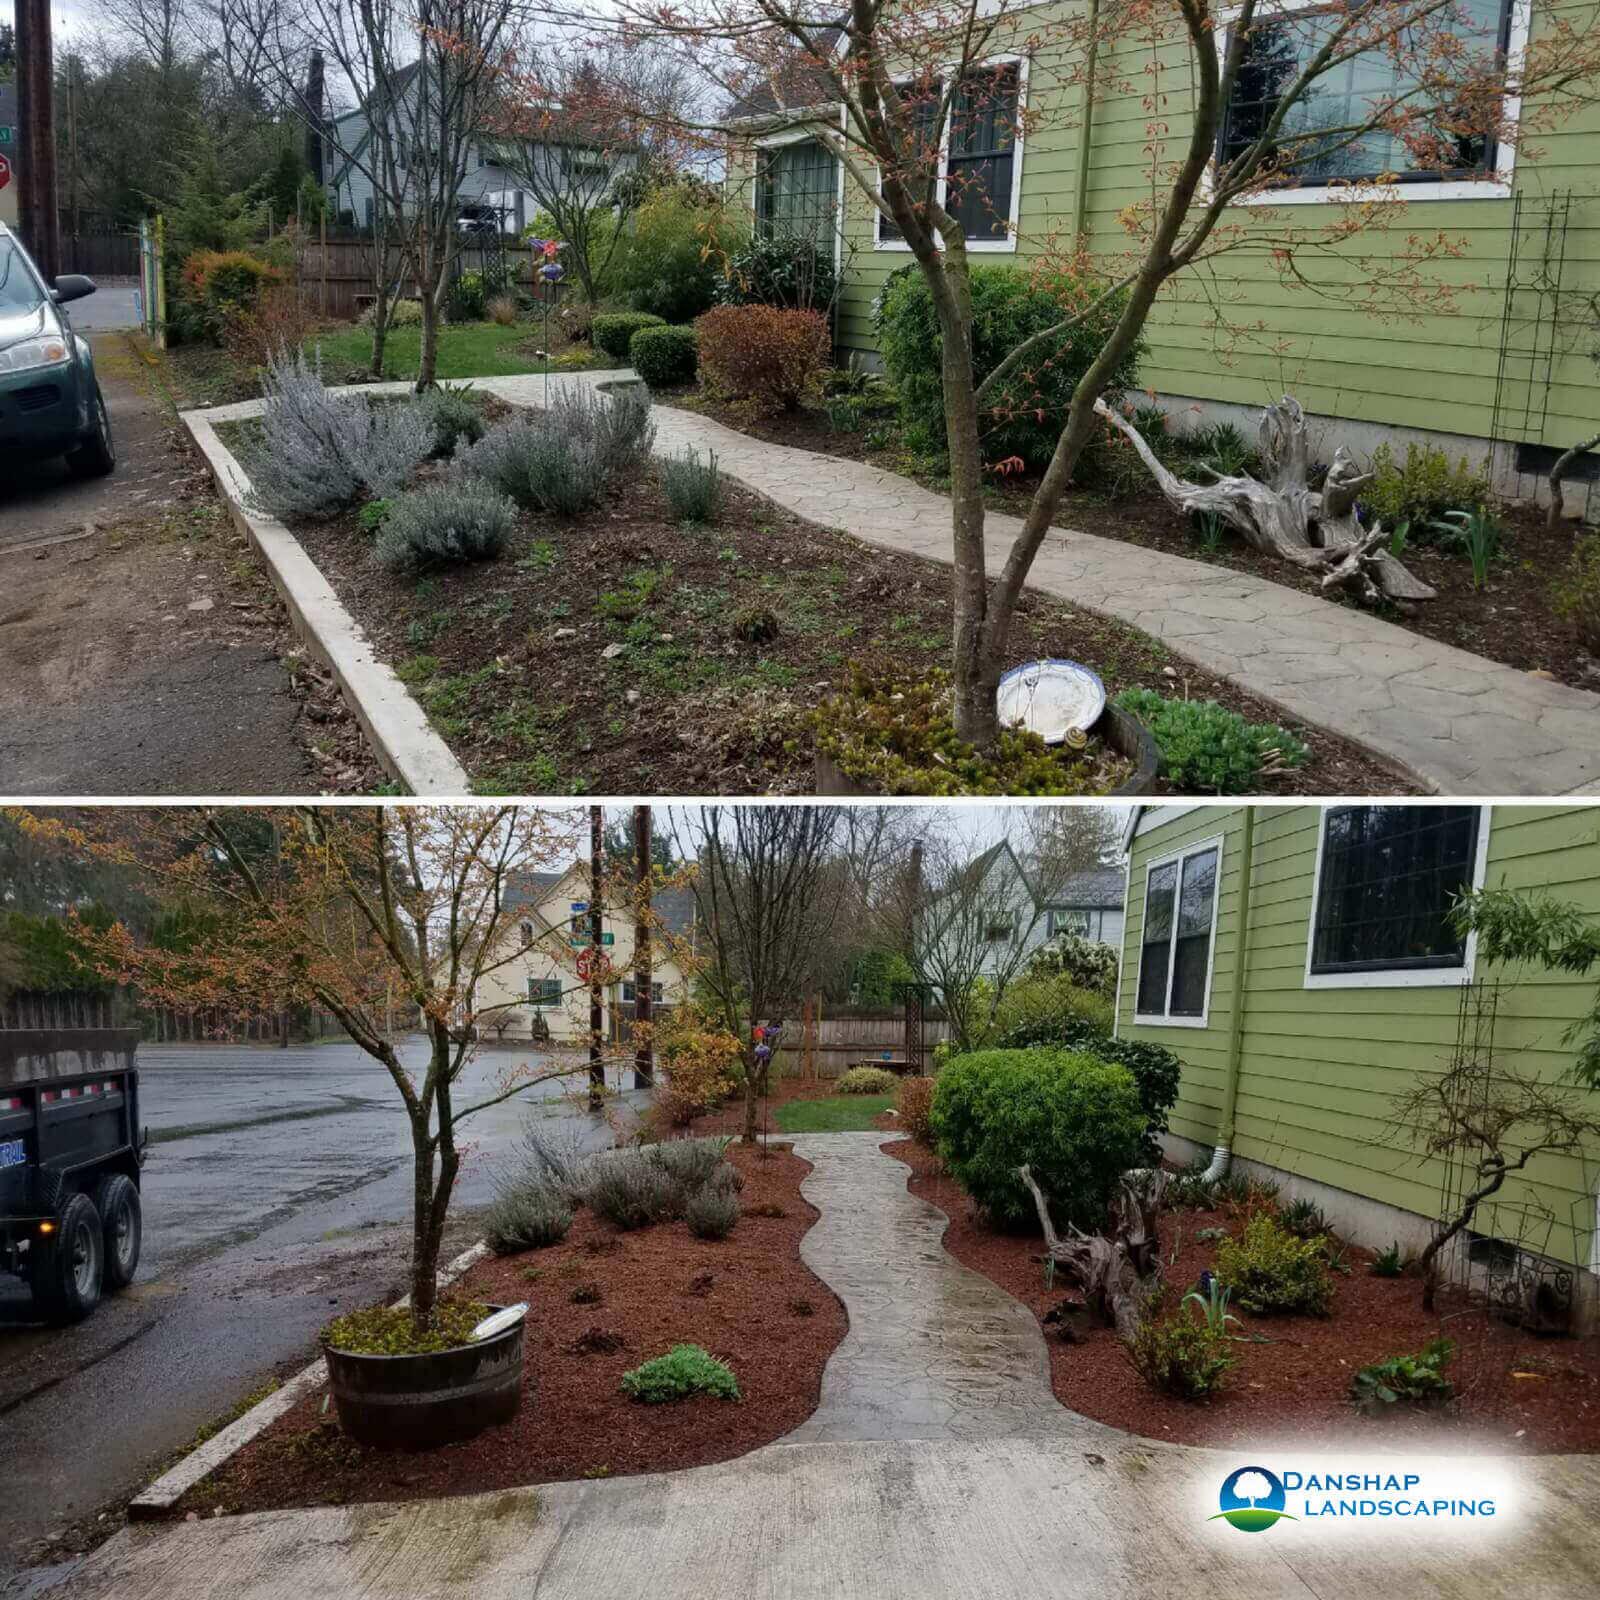 Yard-Cleanup-danshaplandscape-6